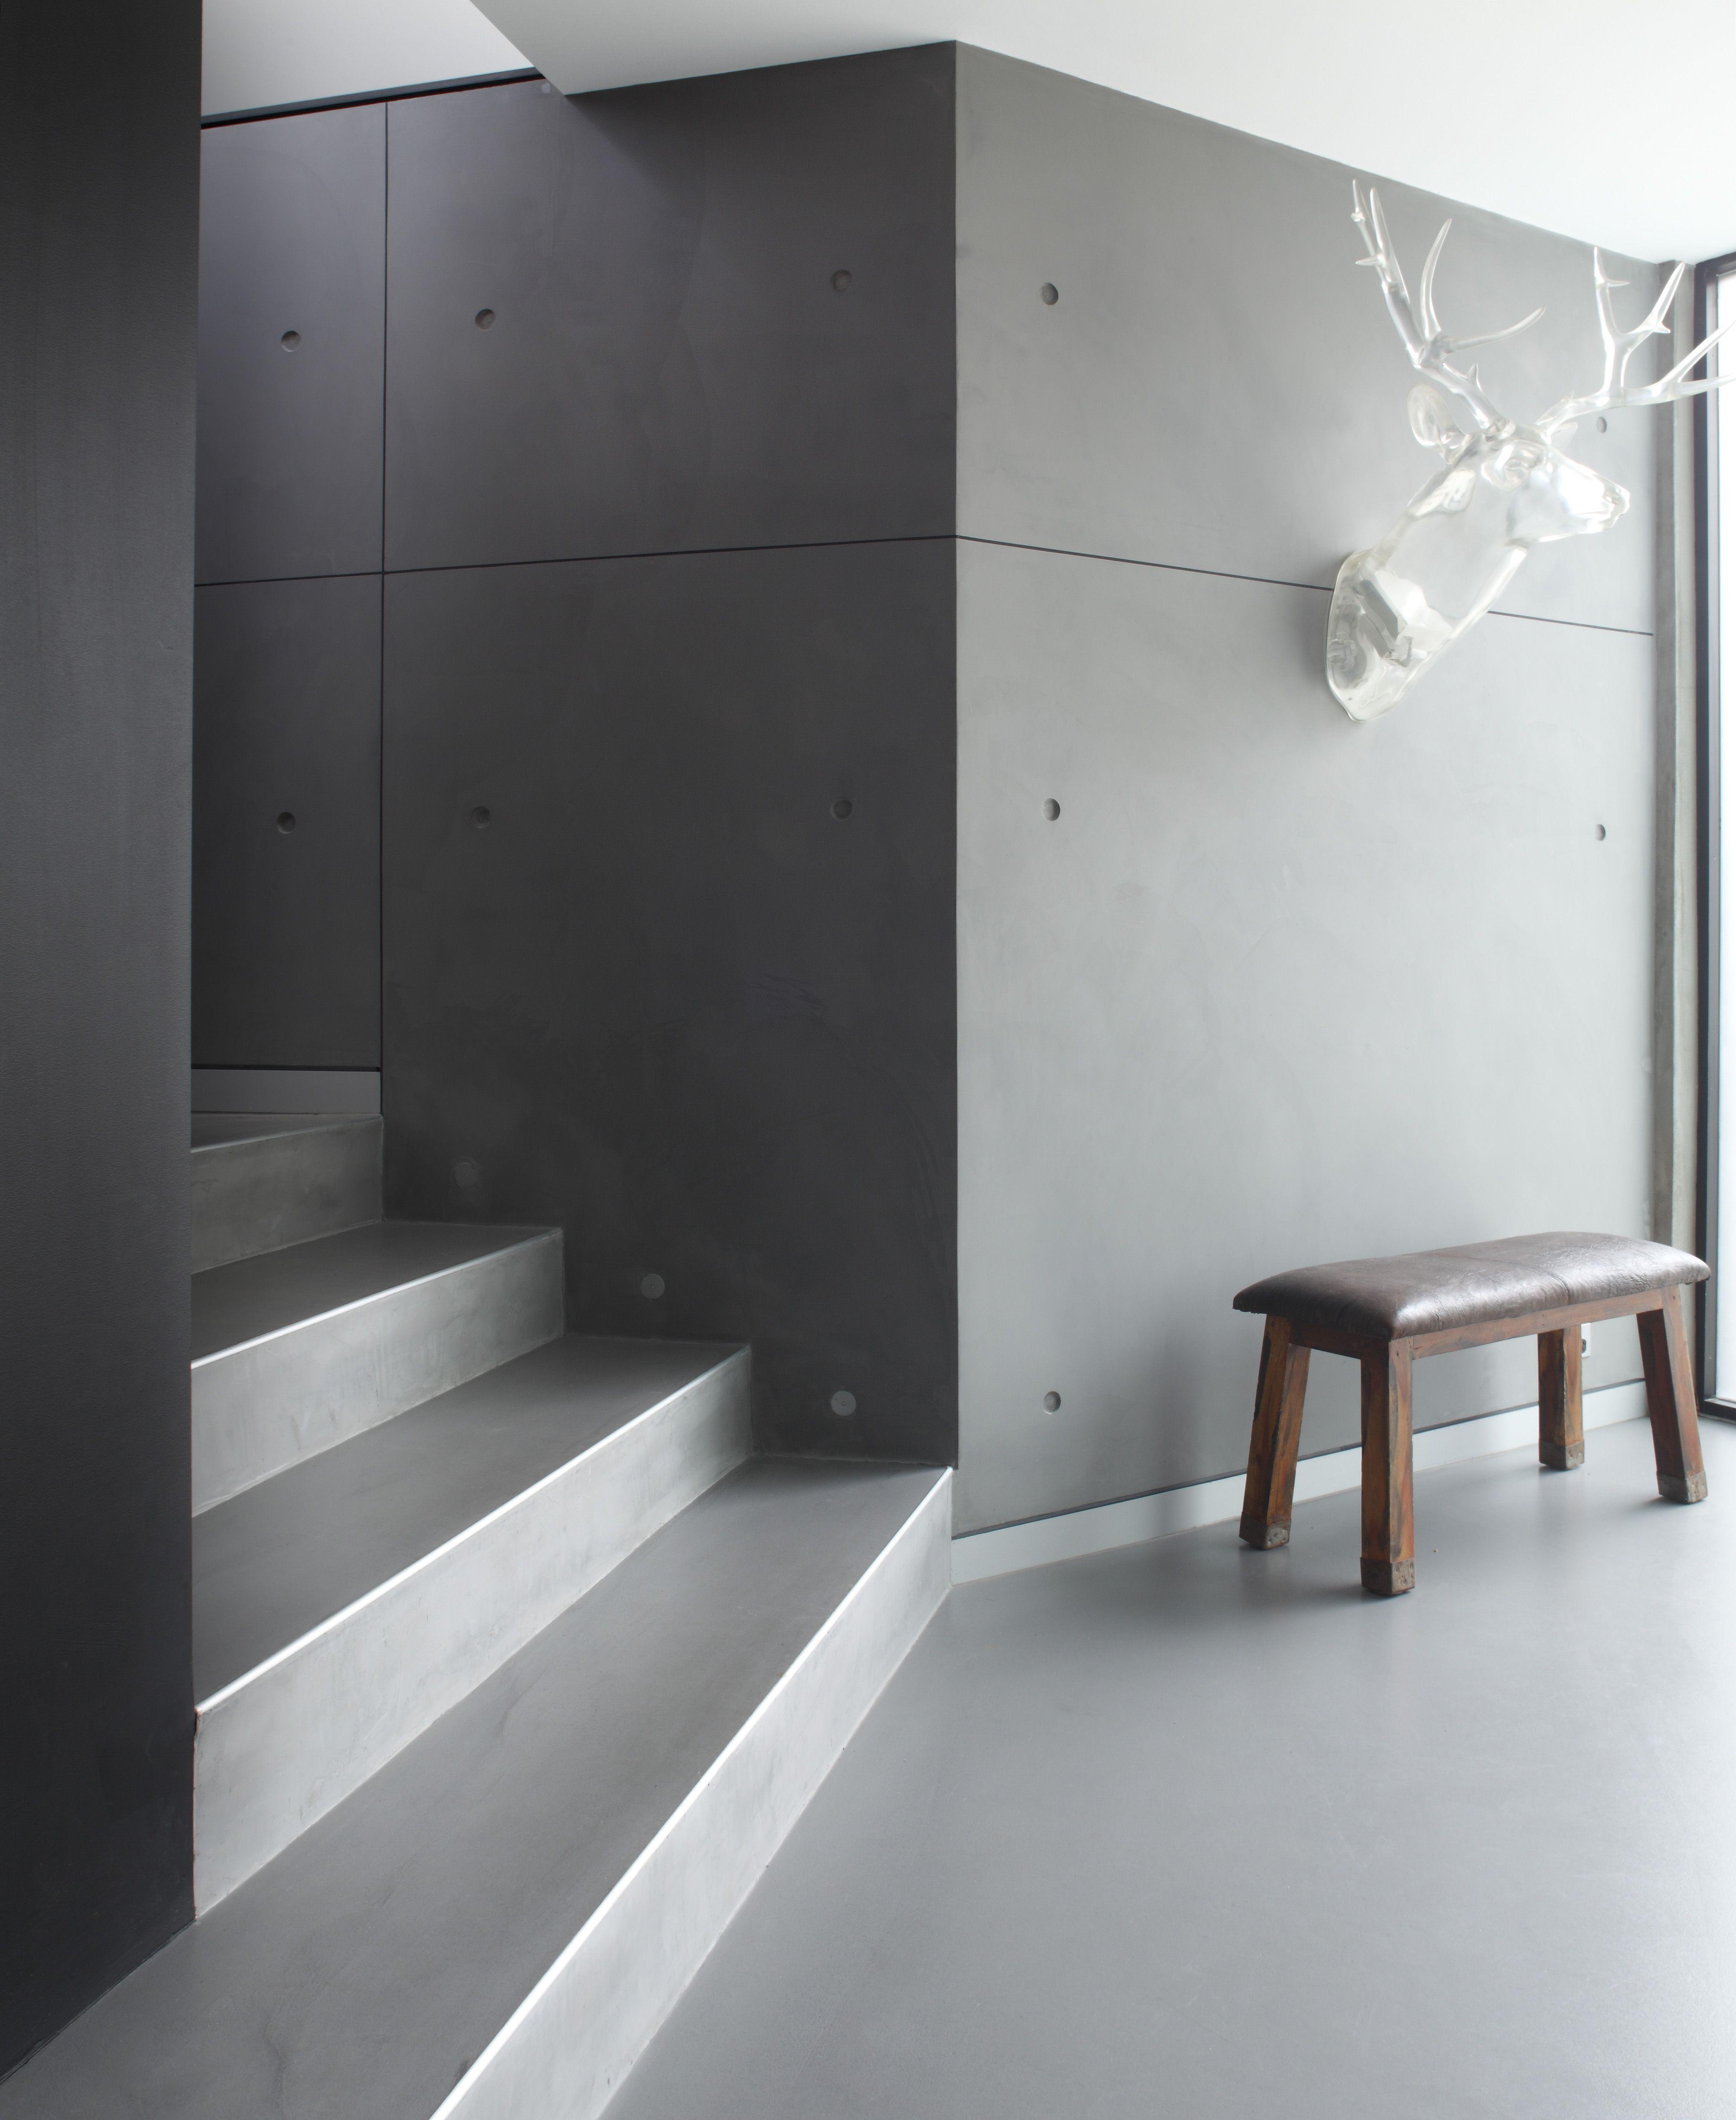 Isolare La Casa Basaluzzo concrete floor polishing & grinding sydney | concrete